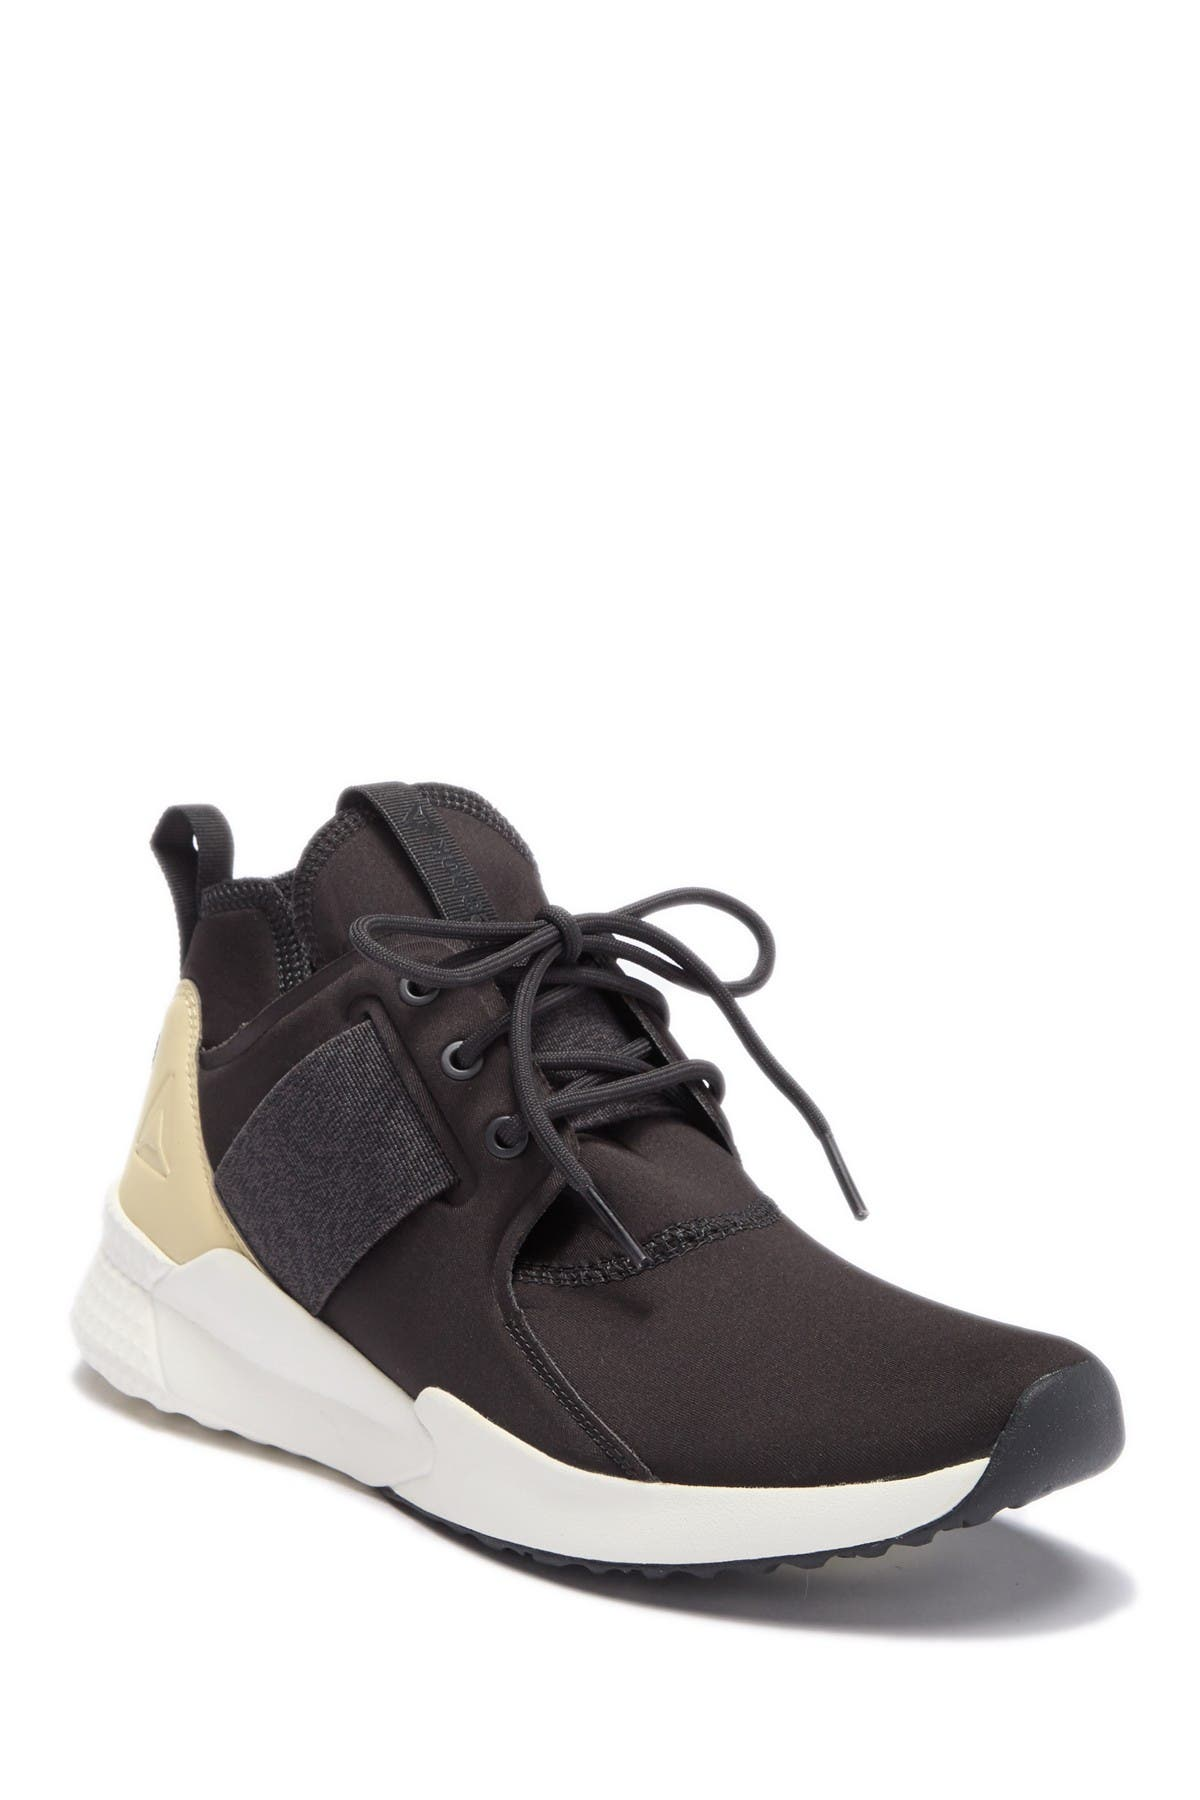 Reebok   Guresu 1.0 Sneaker   Nordstrom